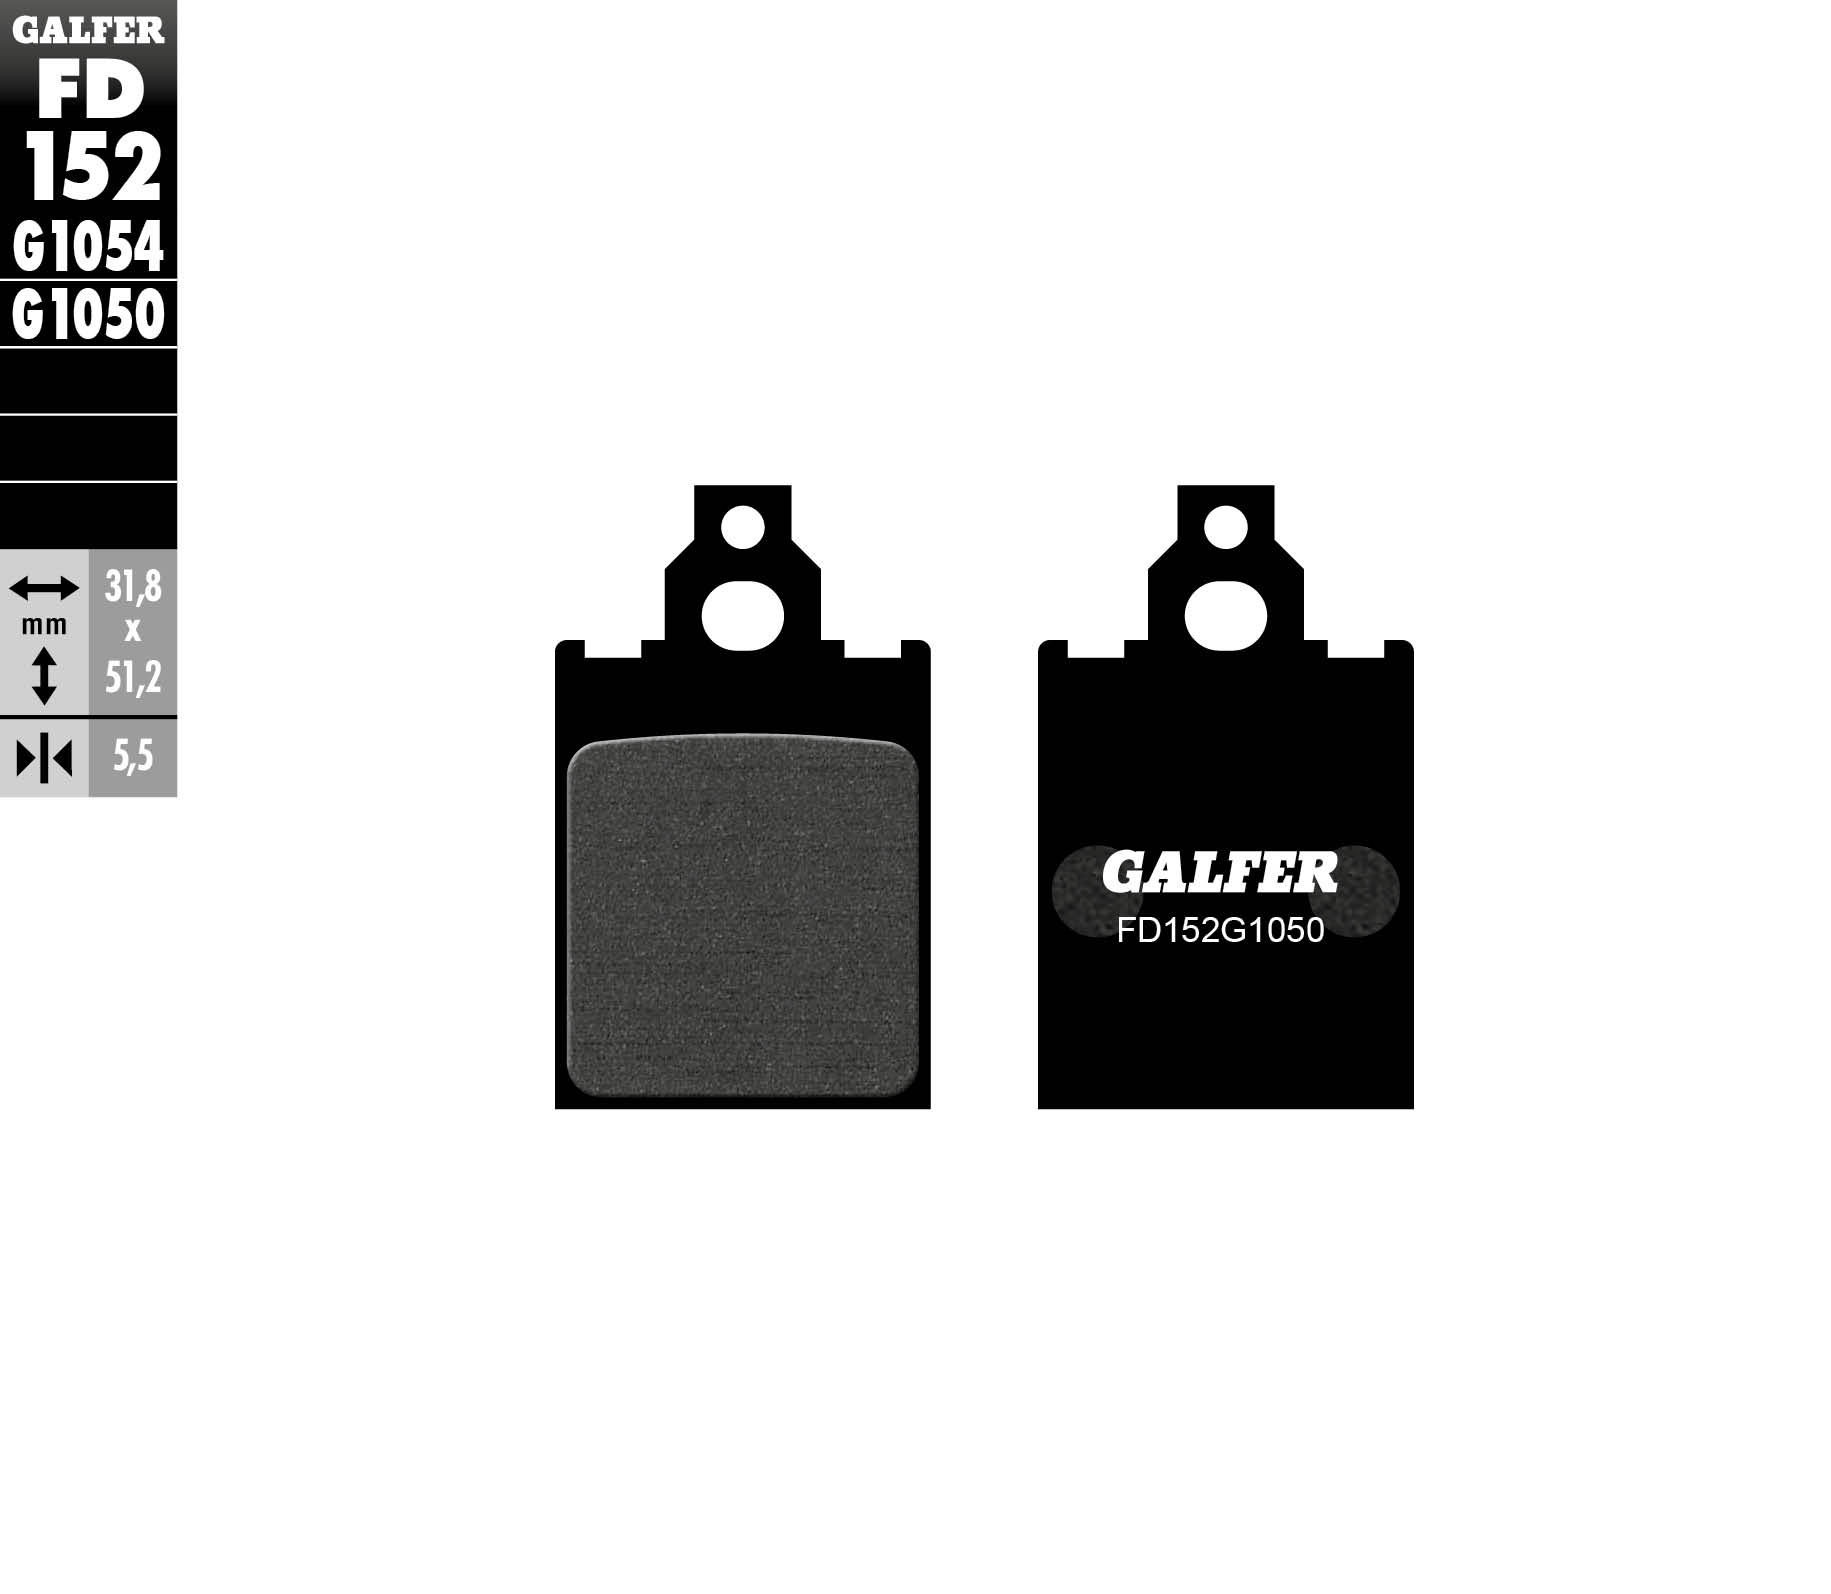 PASTILLAS-DE-FRENO-DELANTERO-GALFER-LML-STAR-125-MAT-SERIES-4T-2010-FD152